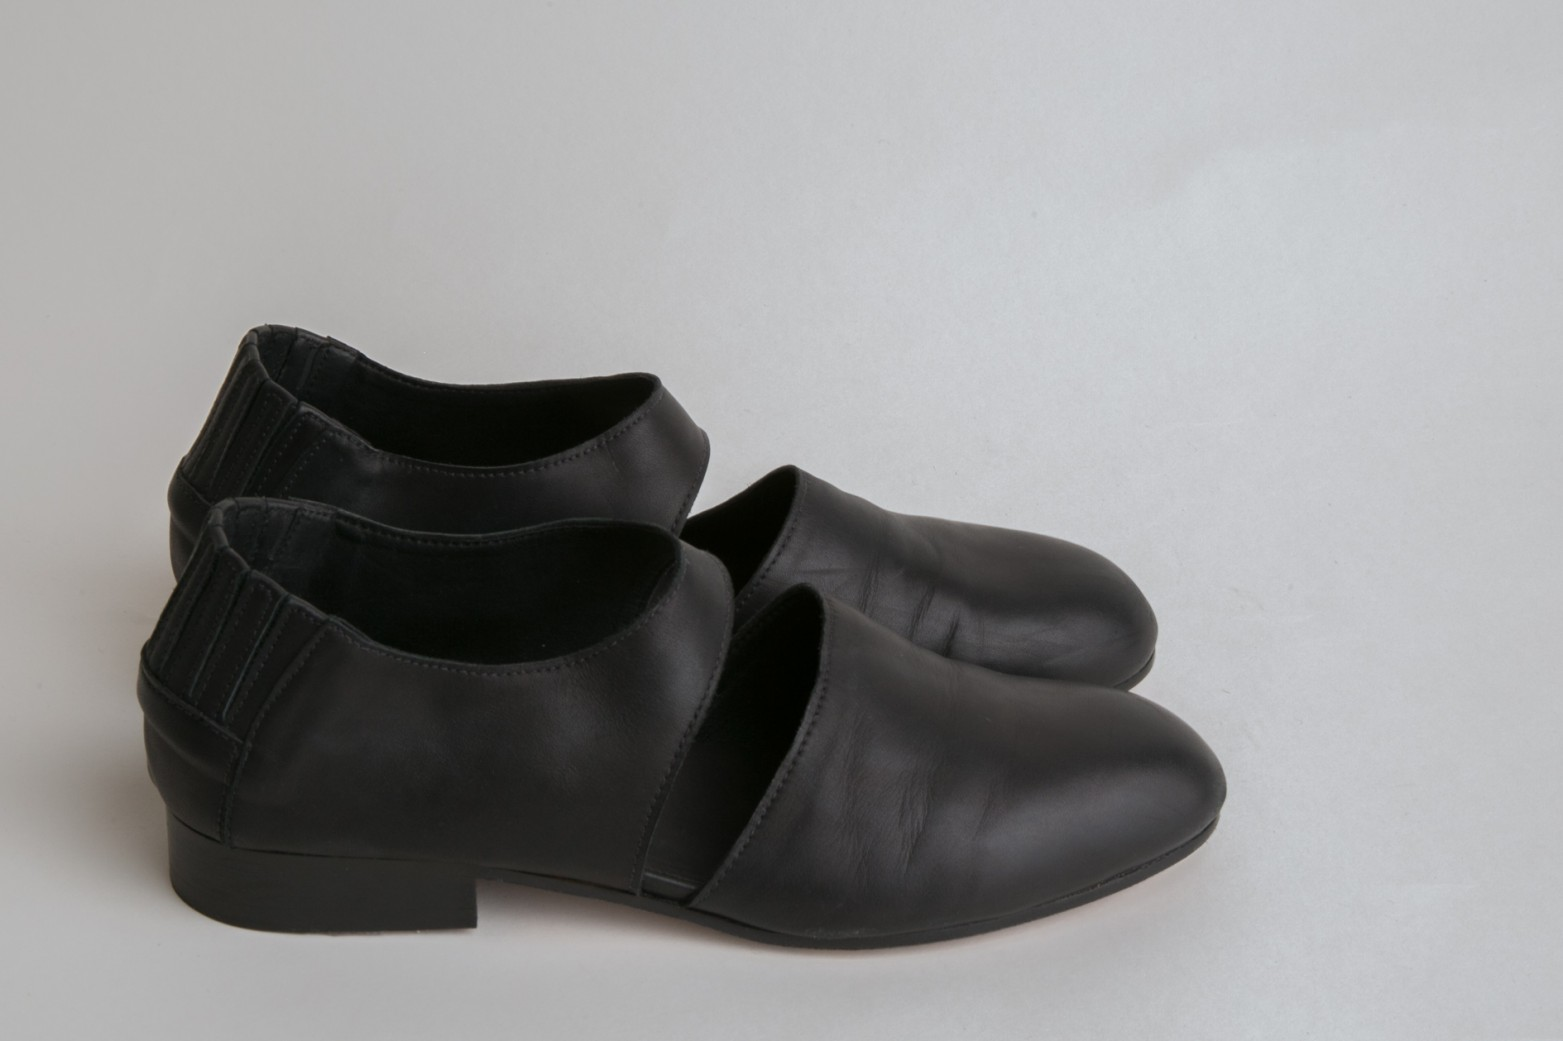 Hed Mayner Derby Shoes